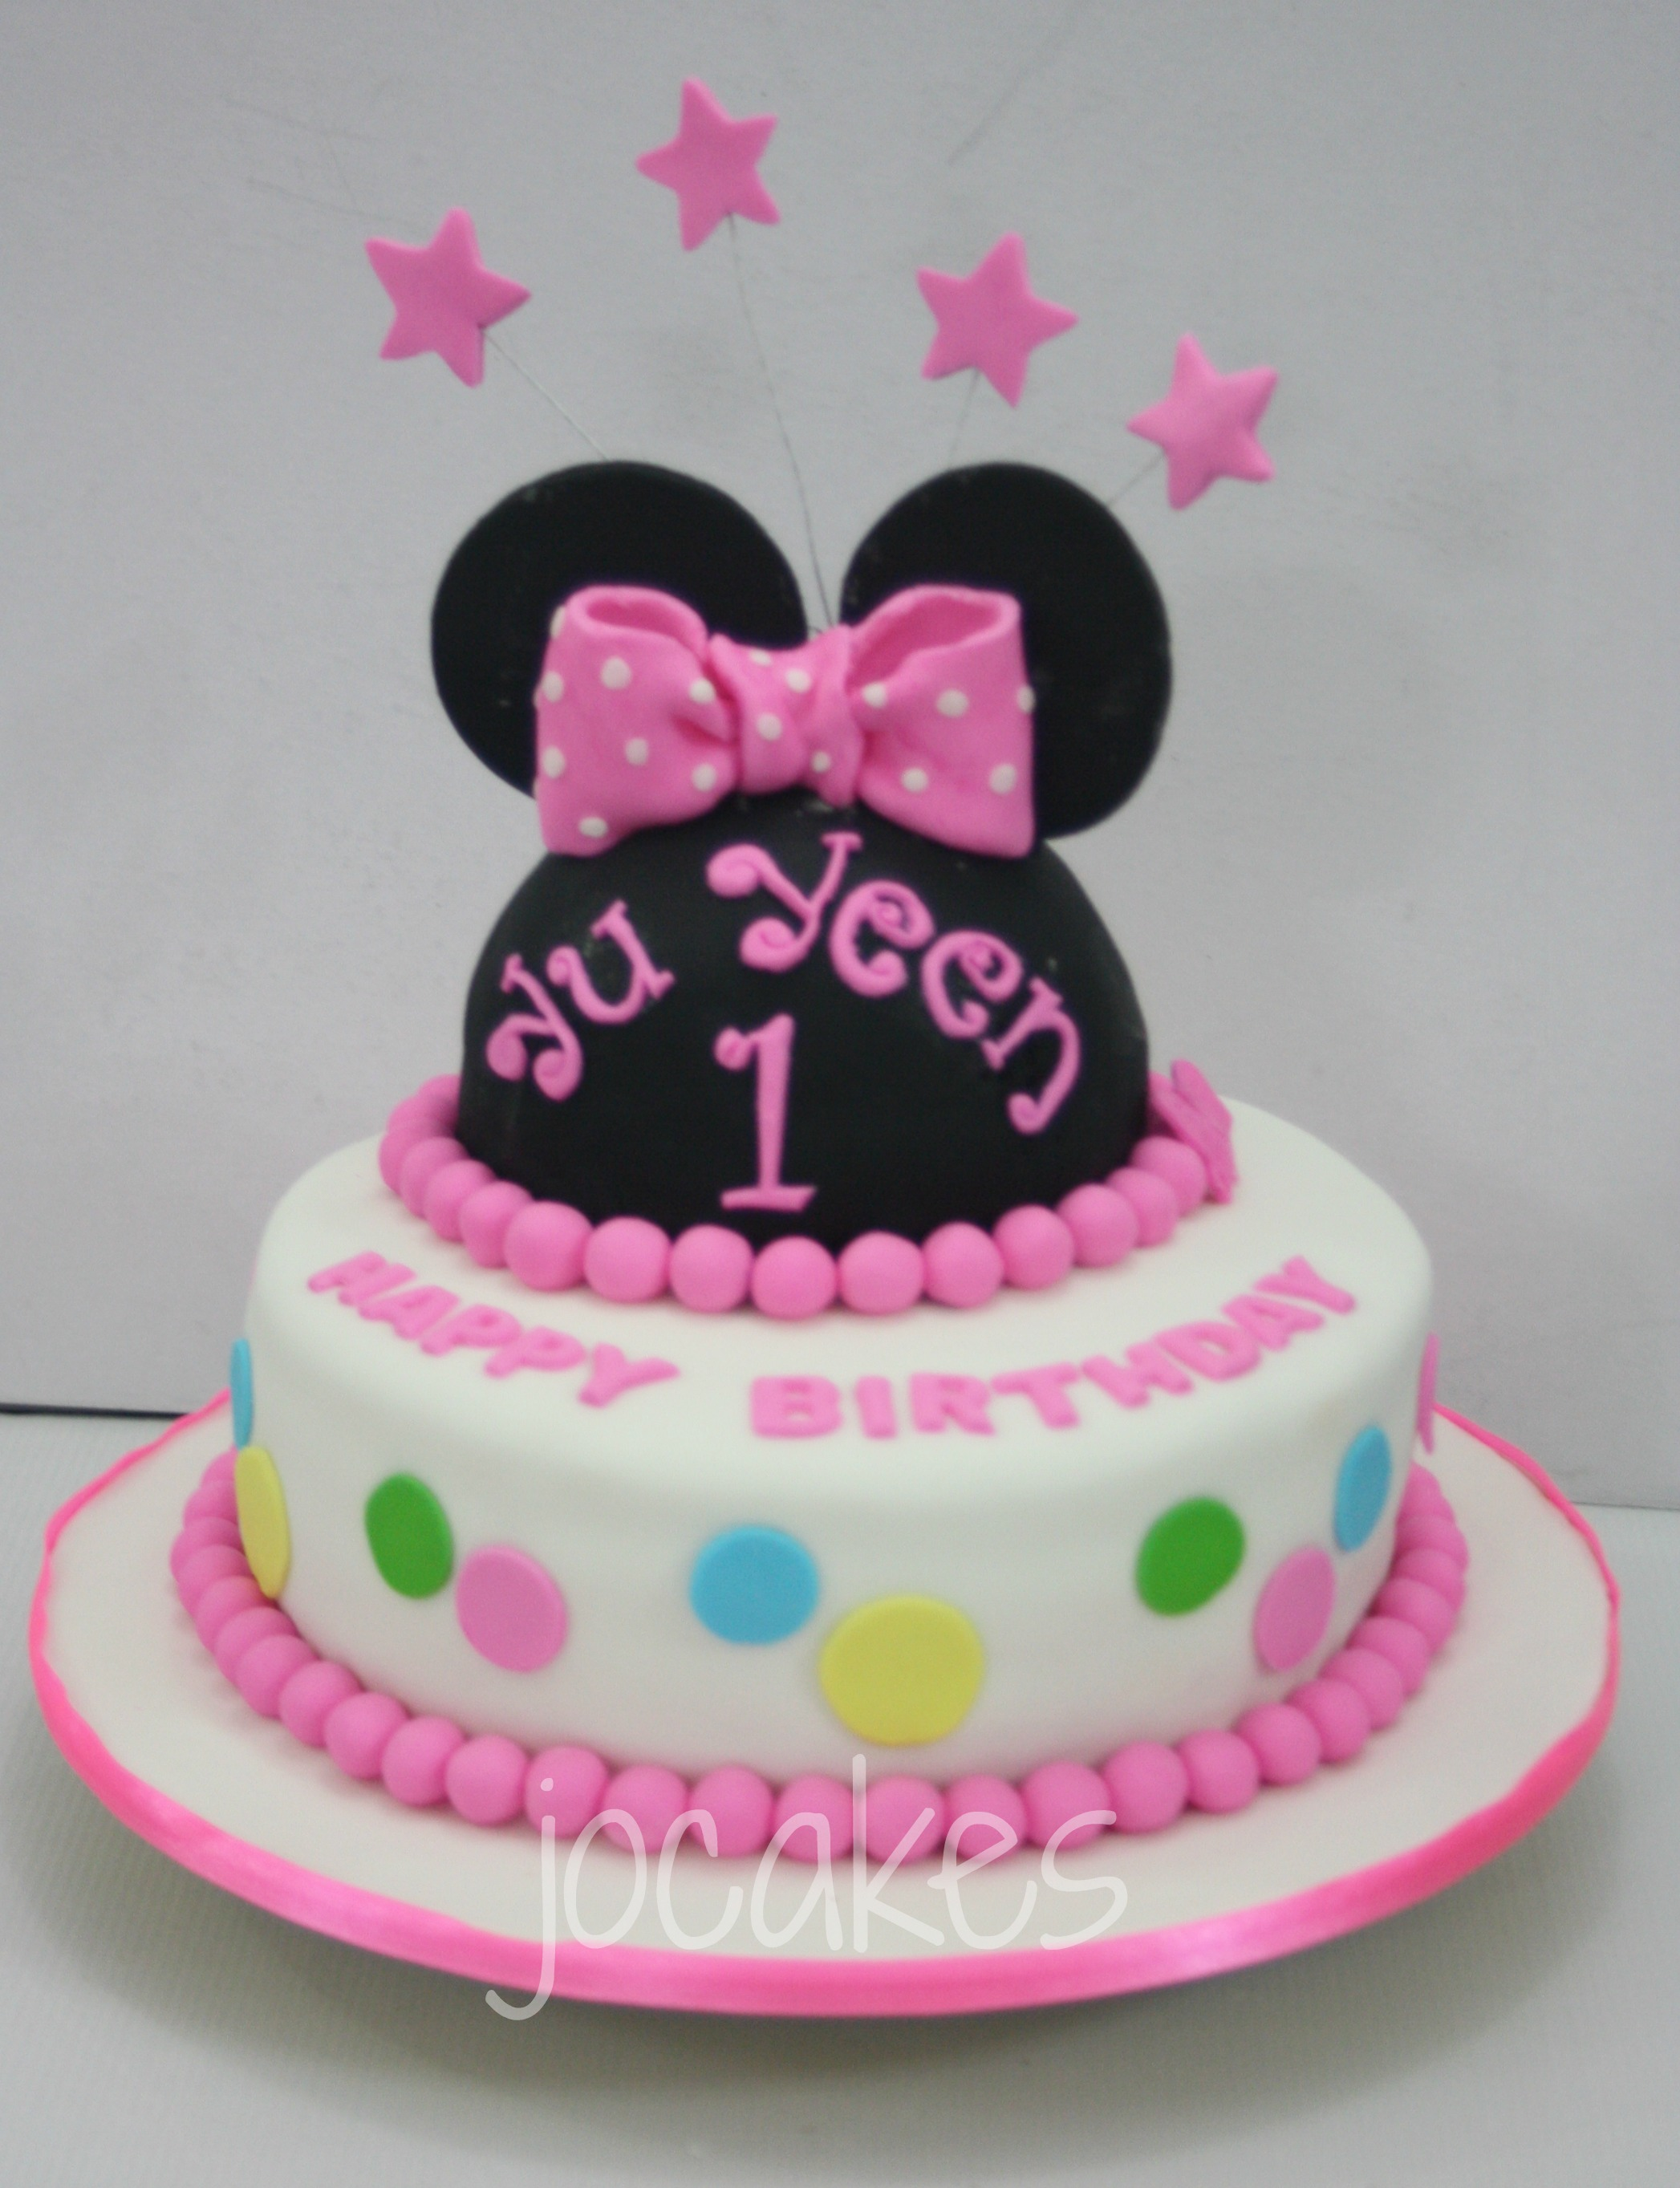 Childrens Cake 1 Year Old Cake Jocakes